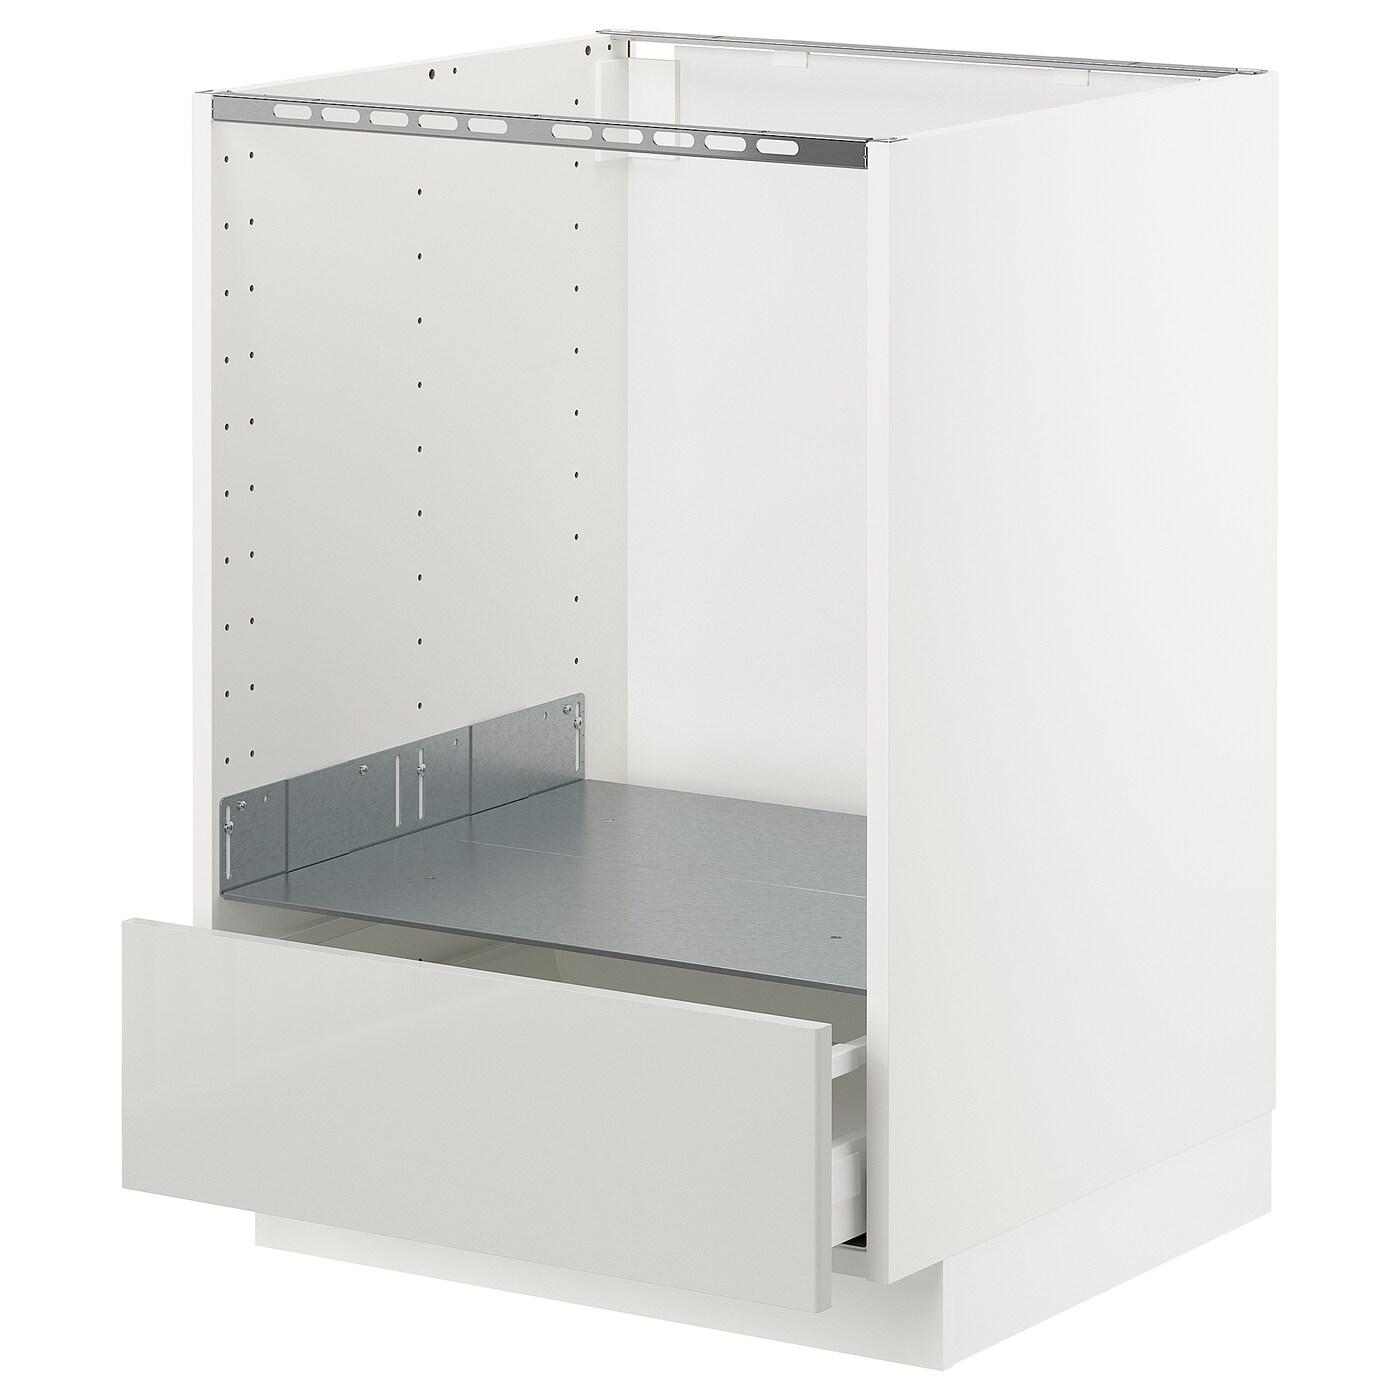 montage tiroir ikea metod good faktum lement vier avec tiroirs faces abstrakt blanc ikea france. Black Bedroom Furniture Sets. Home Design Ideas